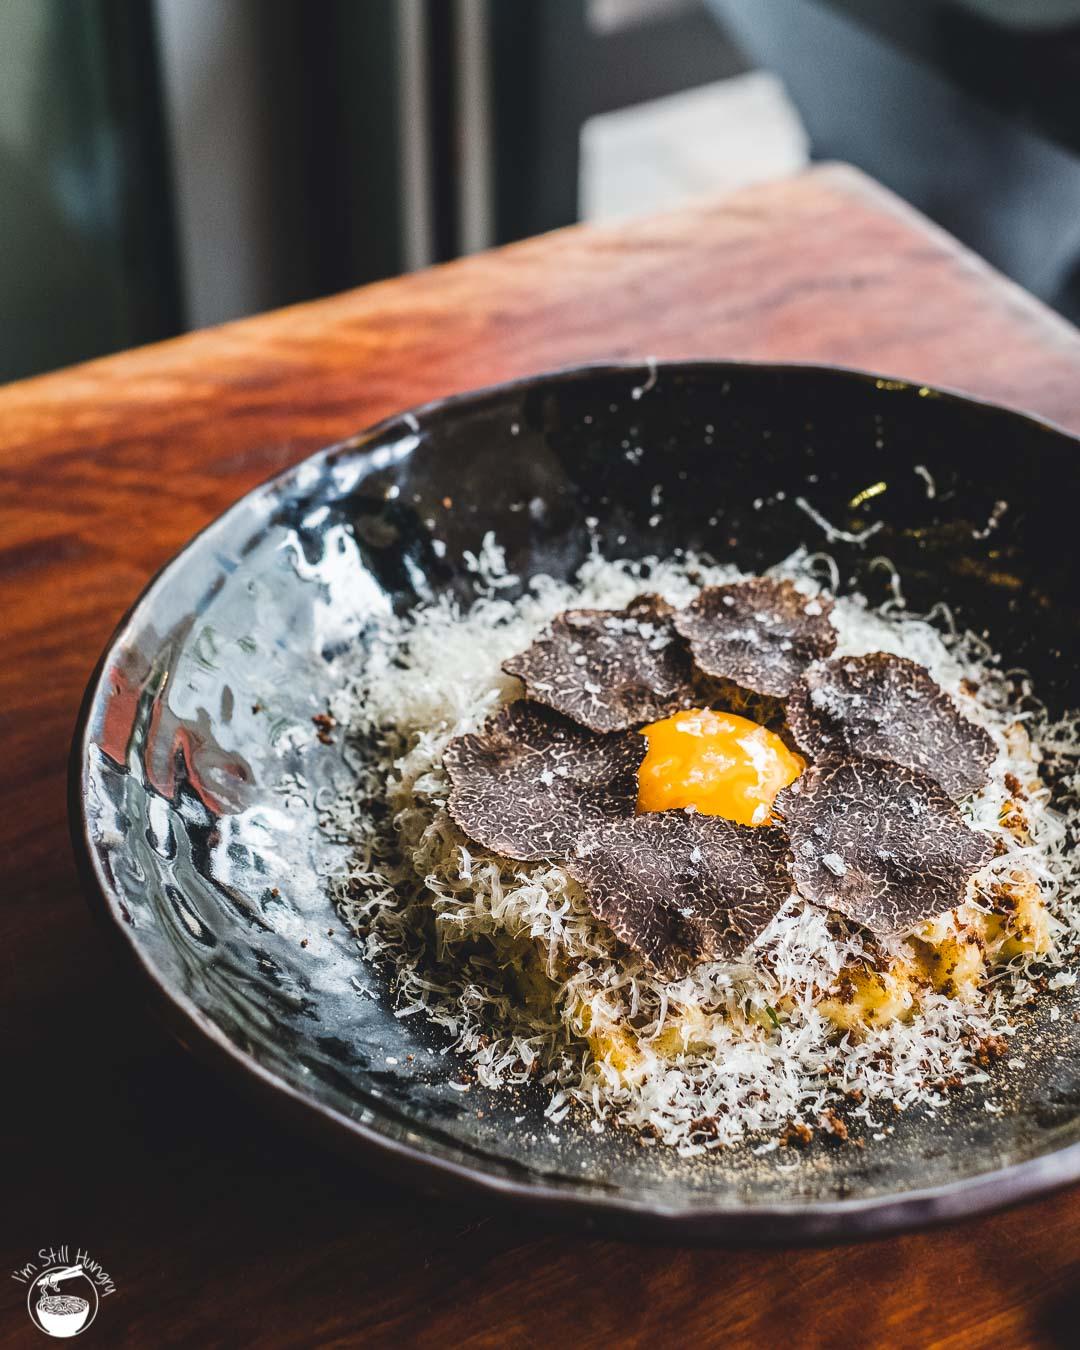 Cavalier Specialty Coffee Truffle Macaroni & cheese: mushroom duxelles, snowy grana padano, organic egg yolk, shaved truffle